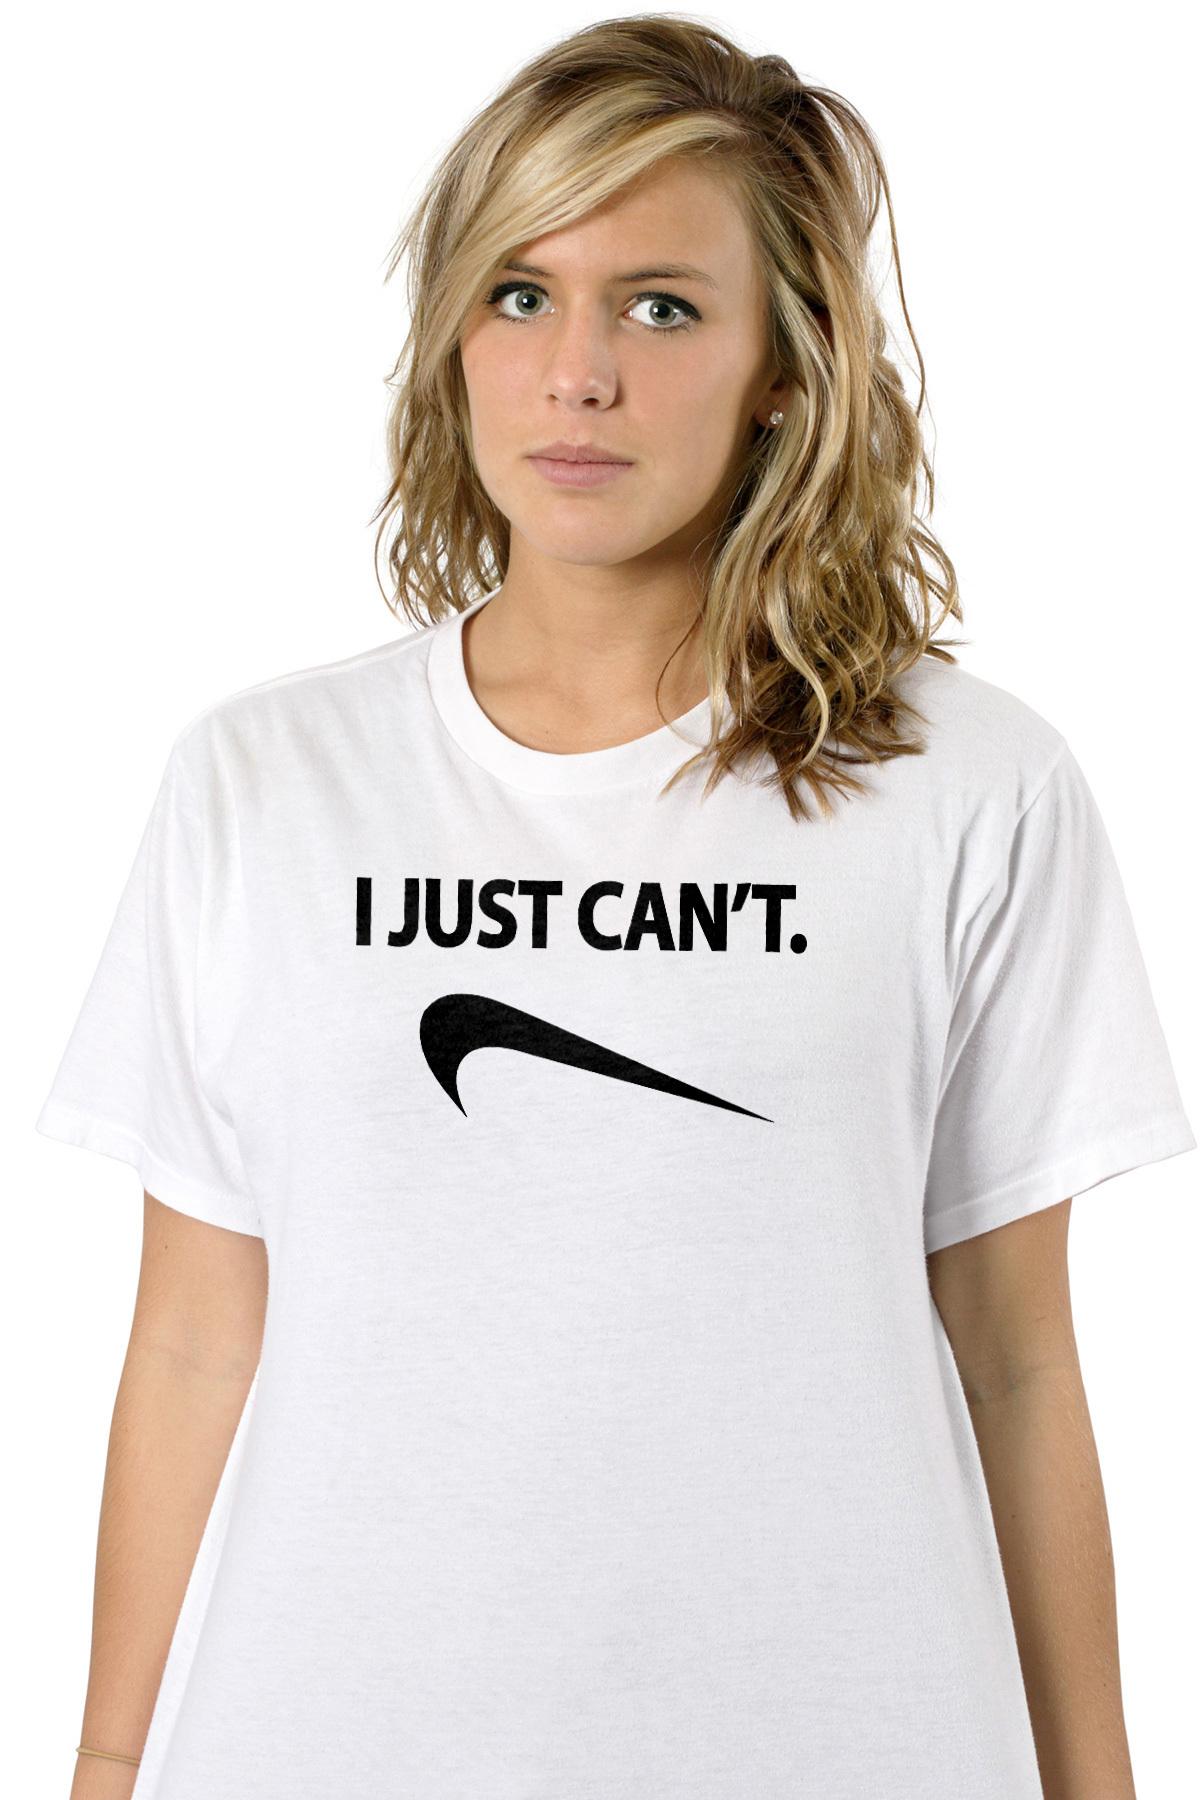 fd2d53ca I Just Can't. Nike Parody T-Shirt shirt